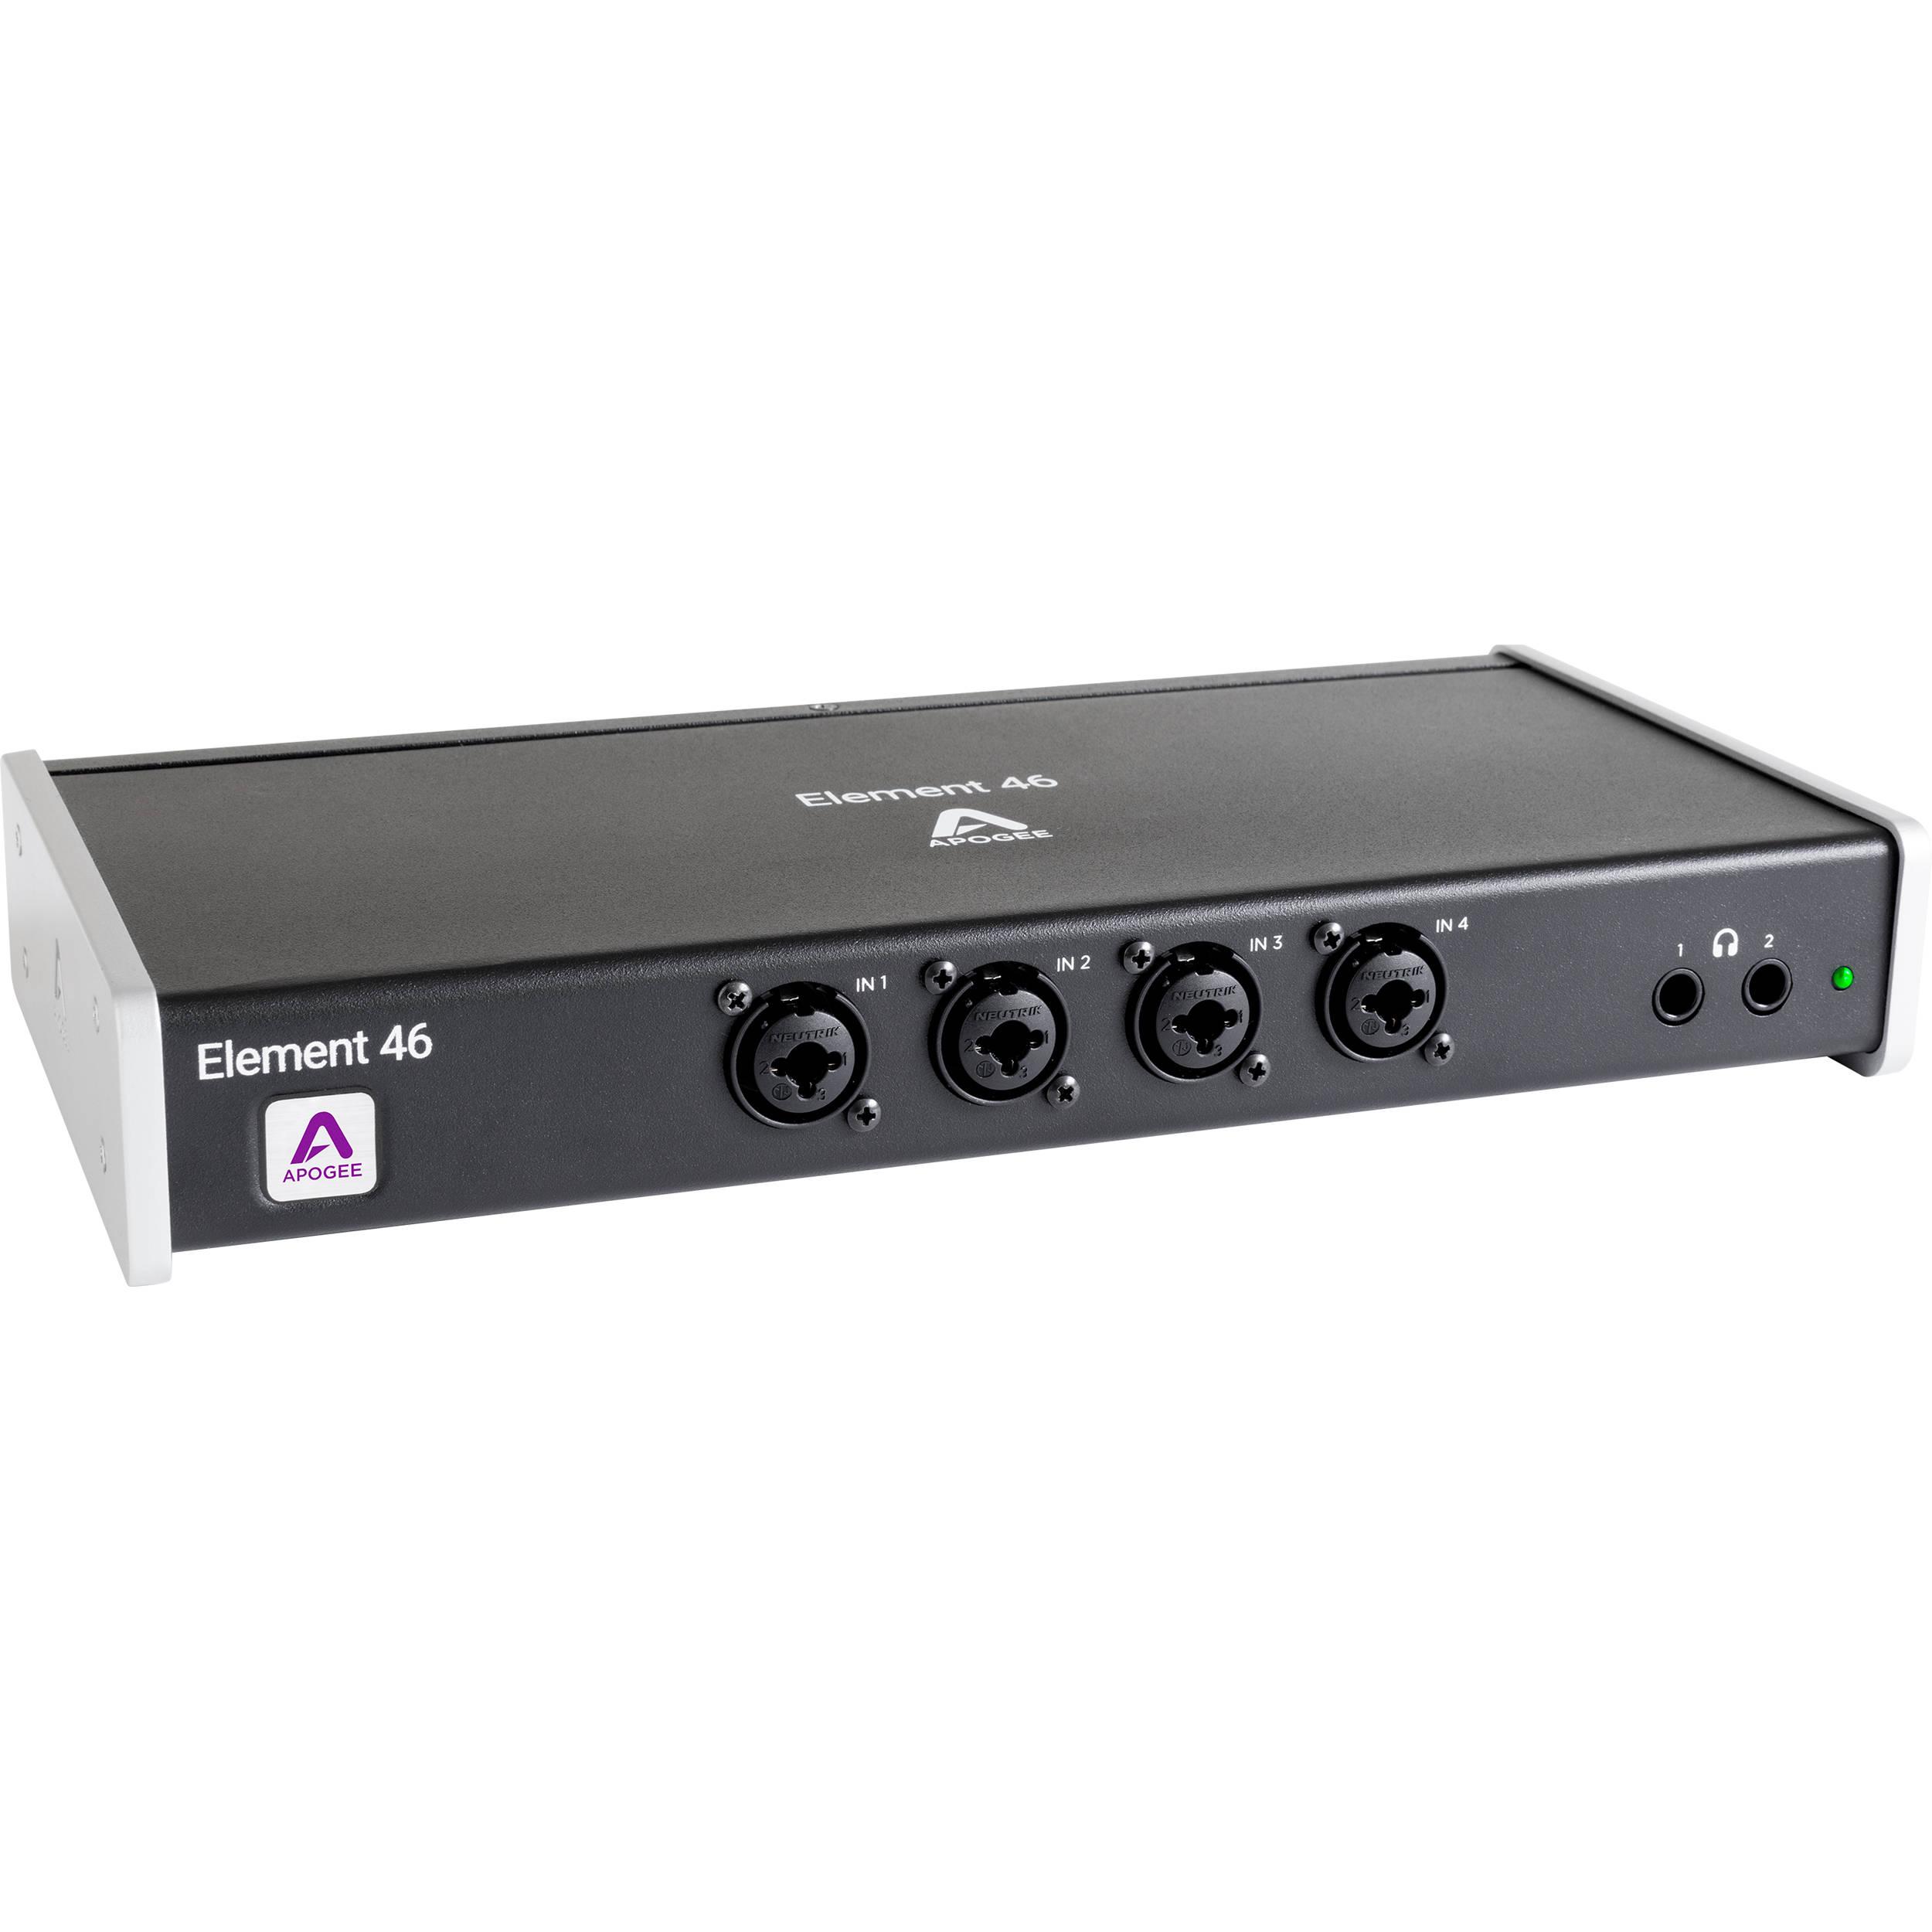 Apogee Electronics Element 46 12x14 Thunderbolt Audio Cable Neutrik Xlr 1 4quot Combo Jacks And Phantom Power Sound Design I O Box For Mac